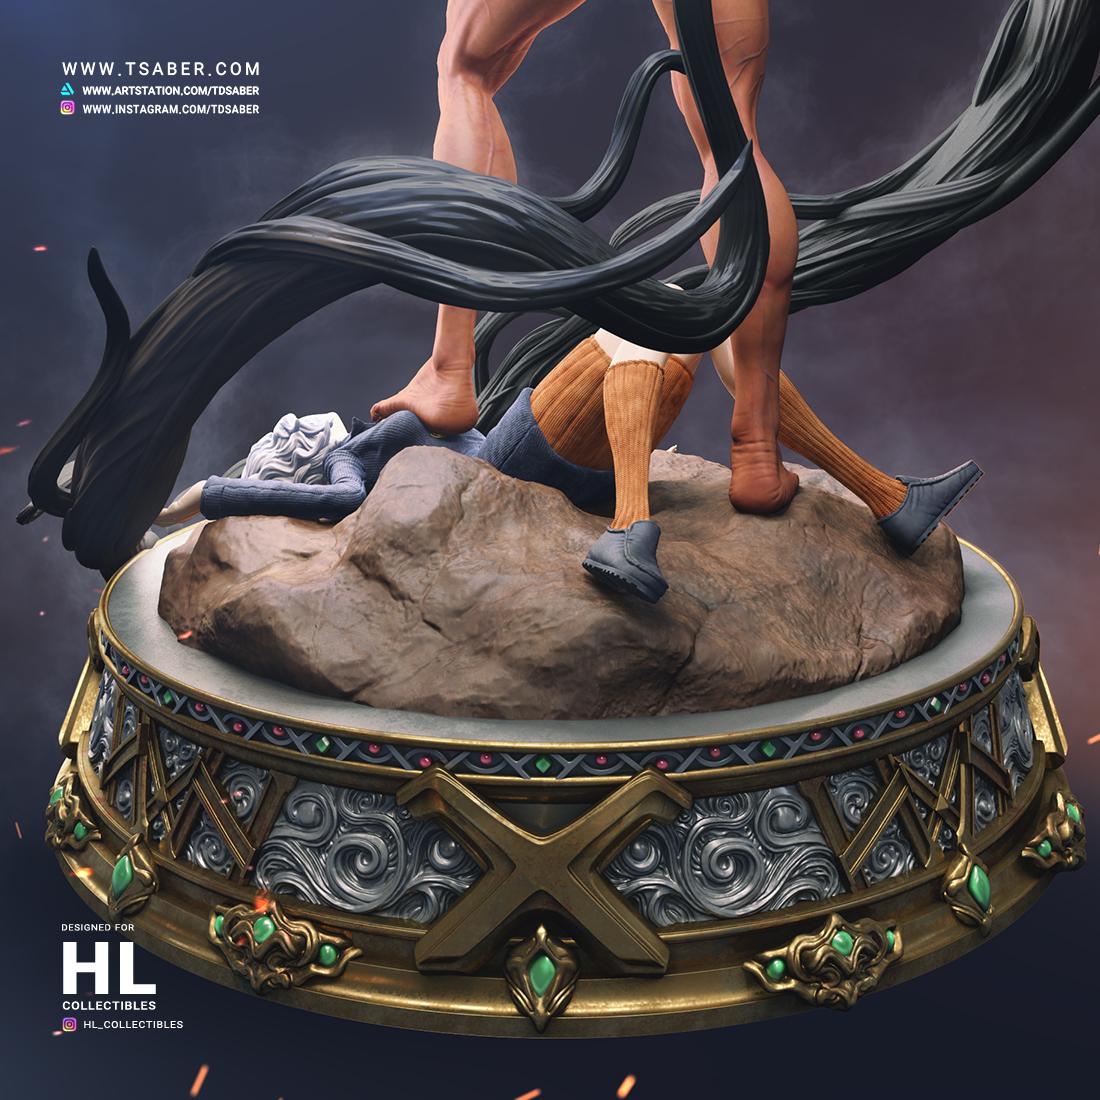 Hunter X Hunter Statue Collectibles - Anime Gov VS Pitou - Tsaber